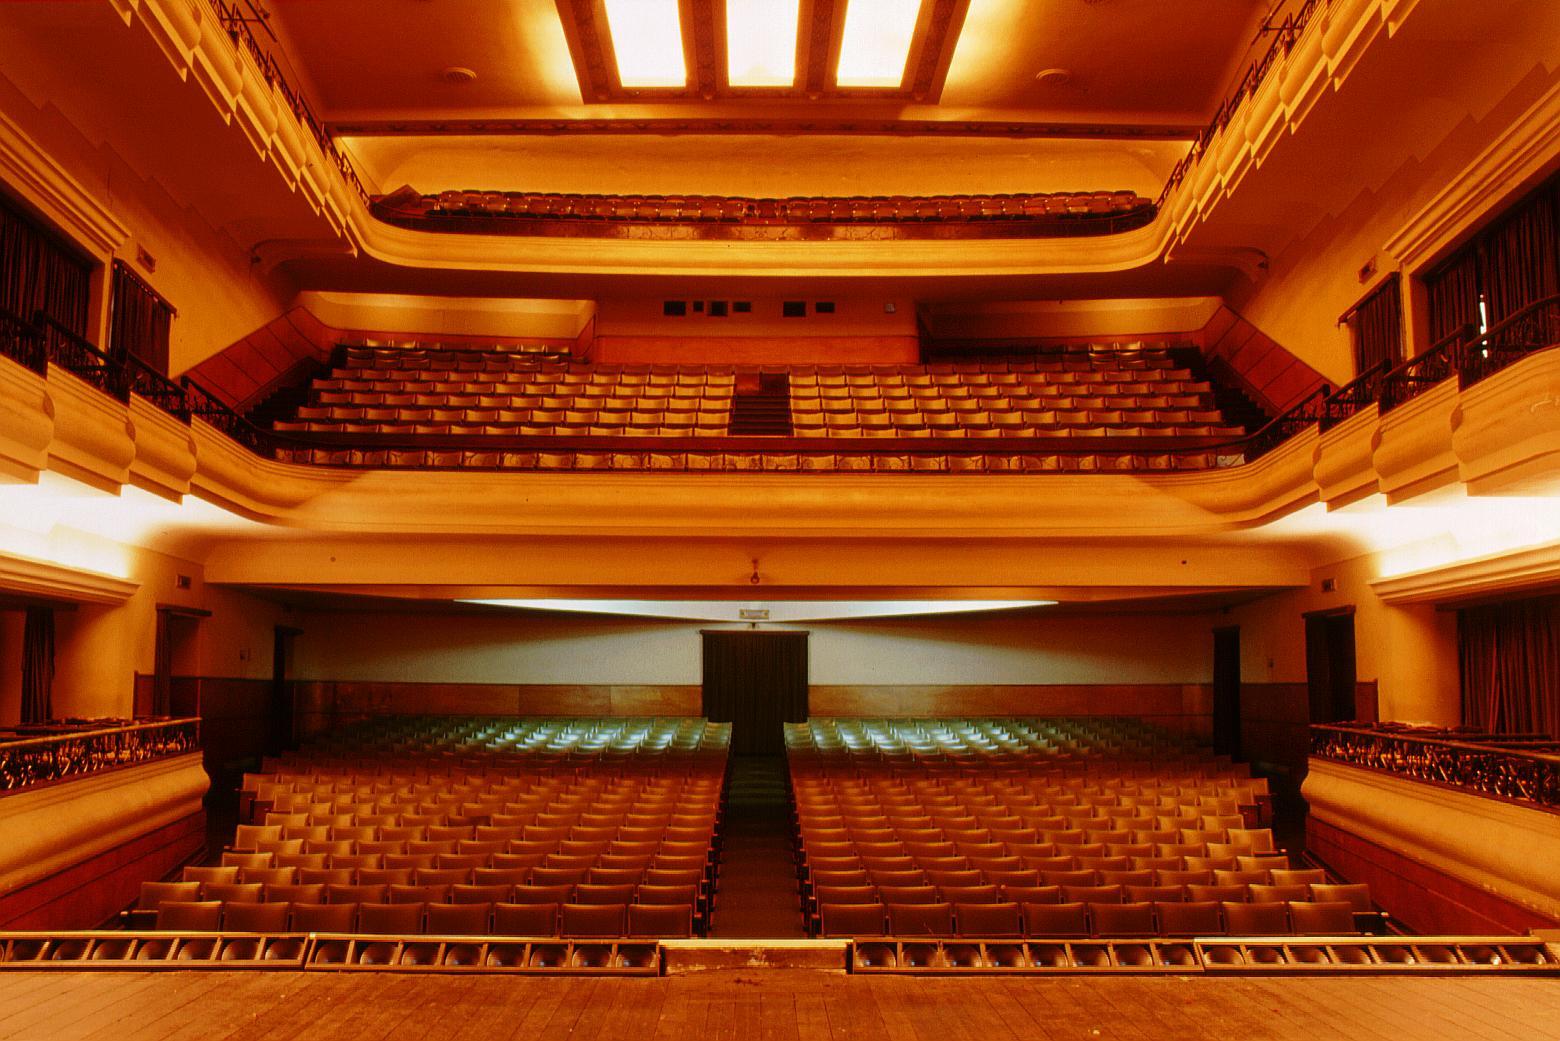 Interior of Teatro Aveirense.